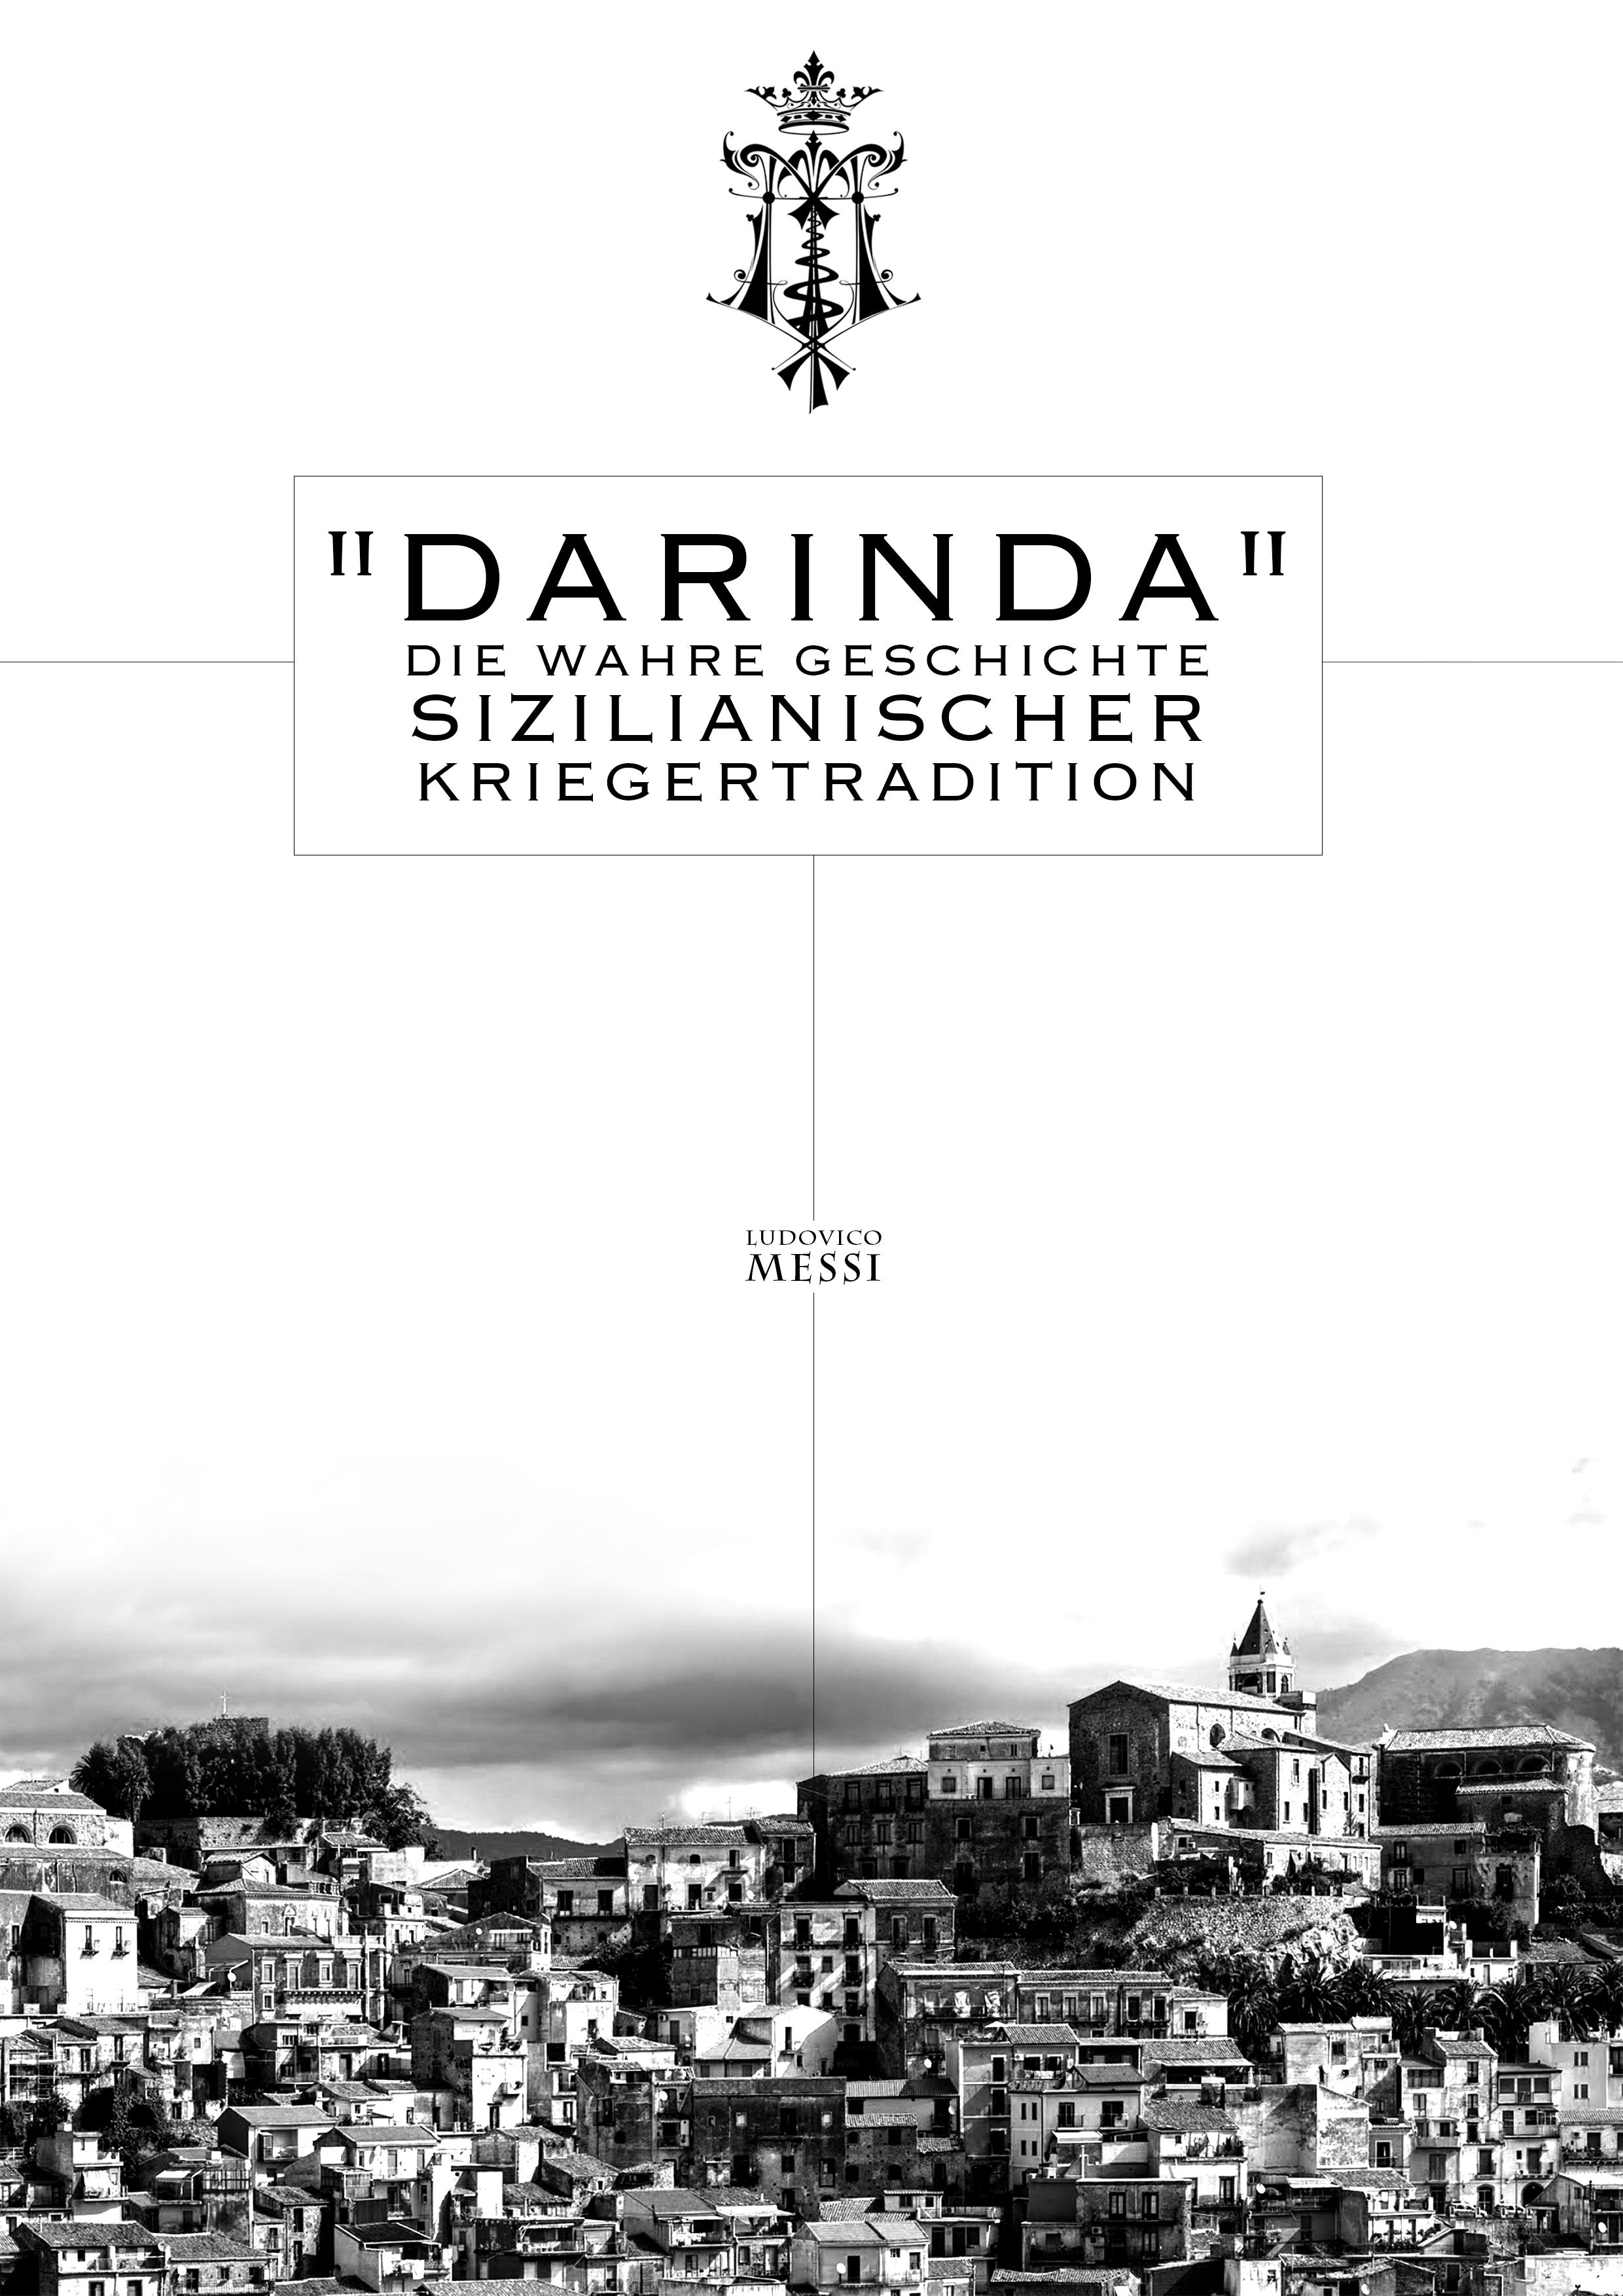 DARINDA. Ludovico Messi